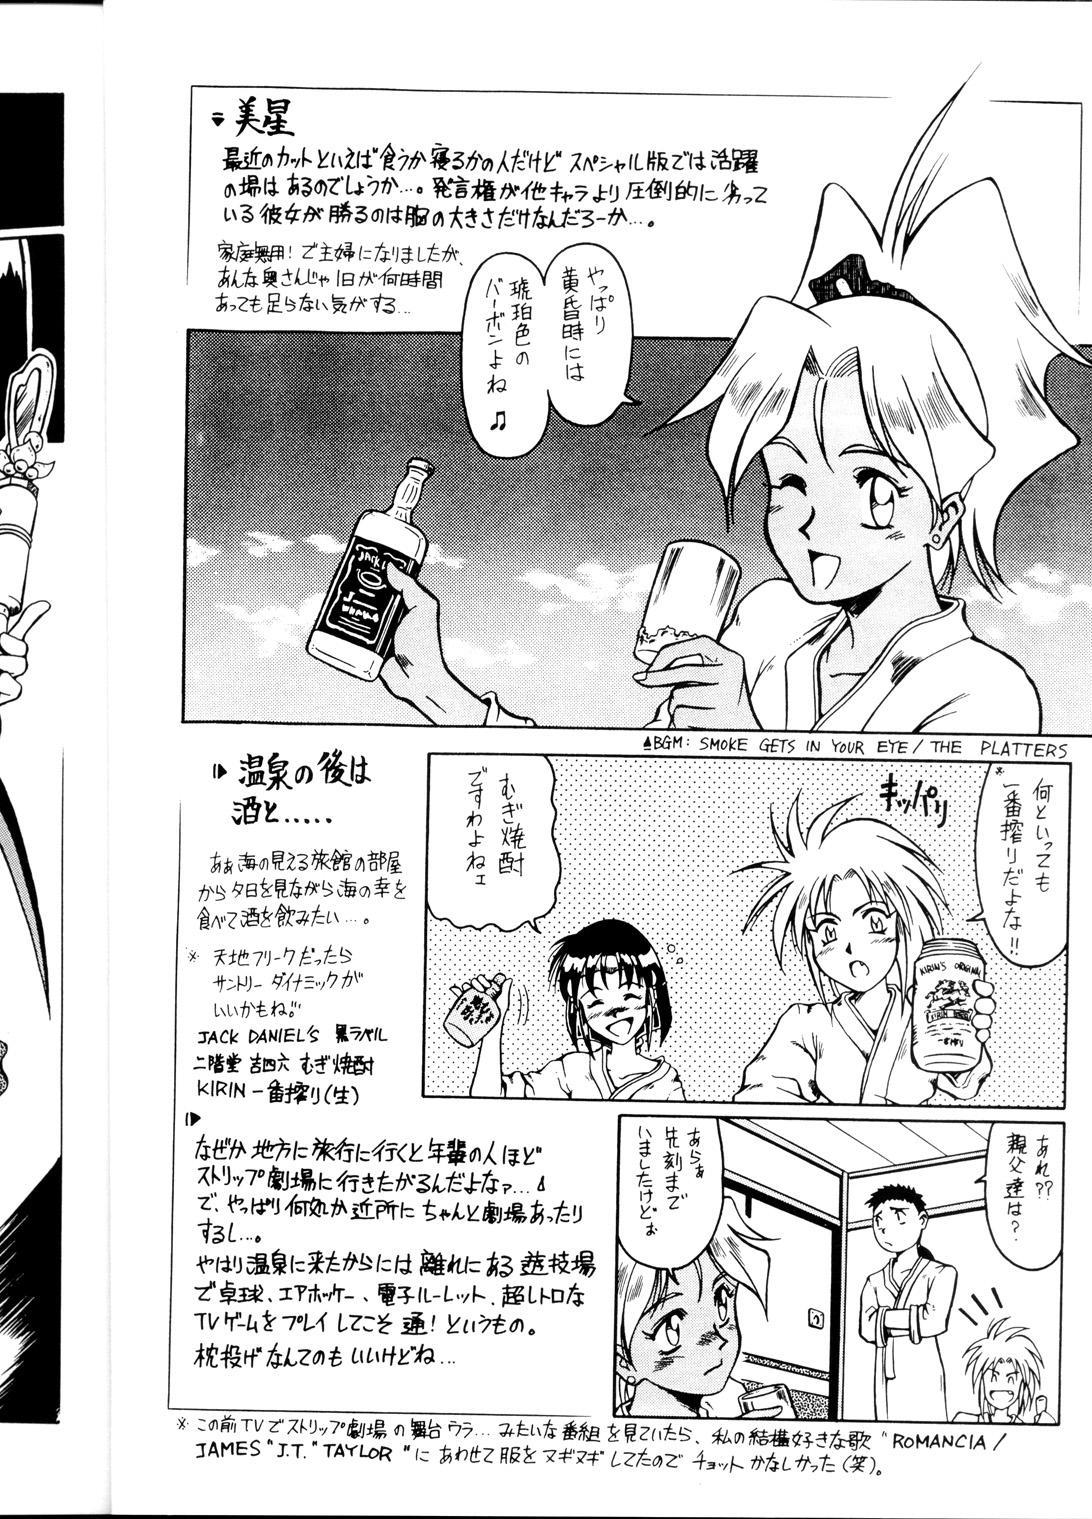 [B.B.C] Tenchi Muyou! Ryou-ou-ki Kaiteiben (Tenchi Muyou!) 10